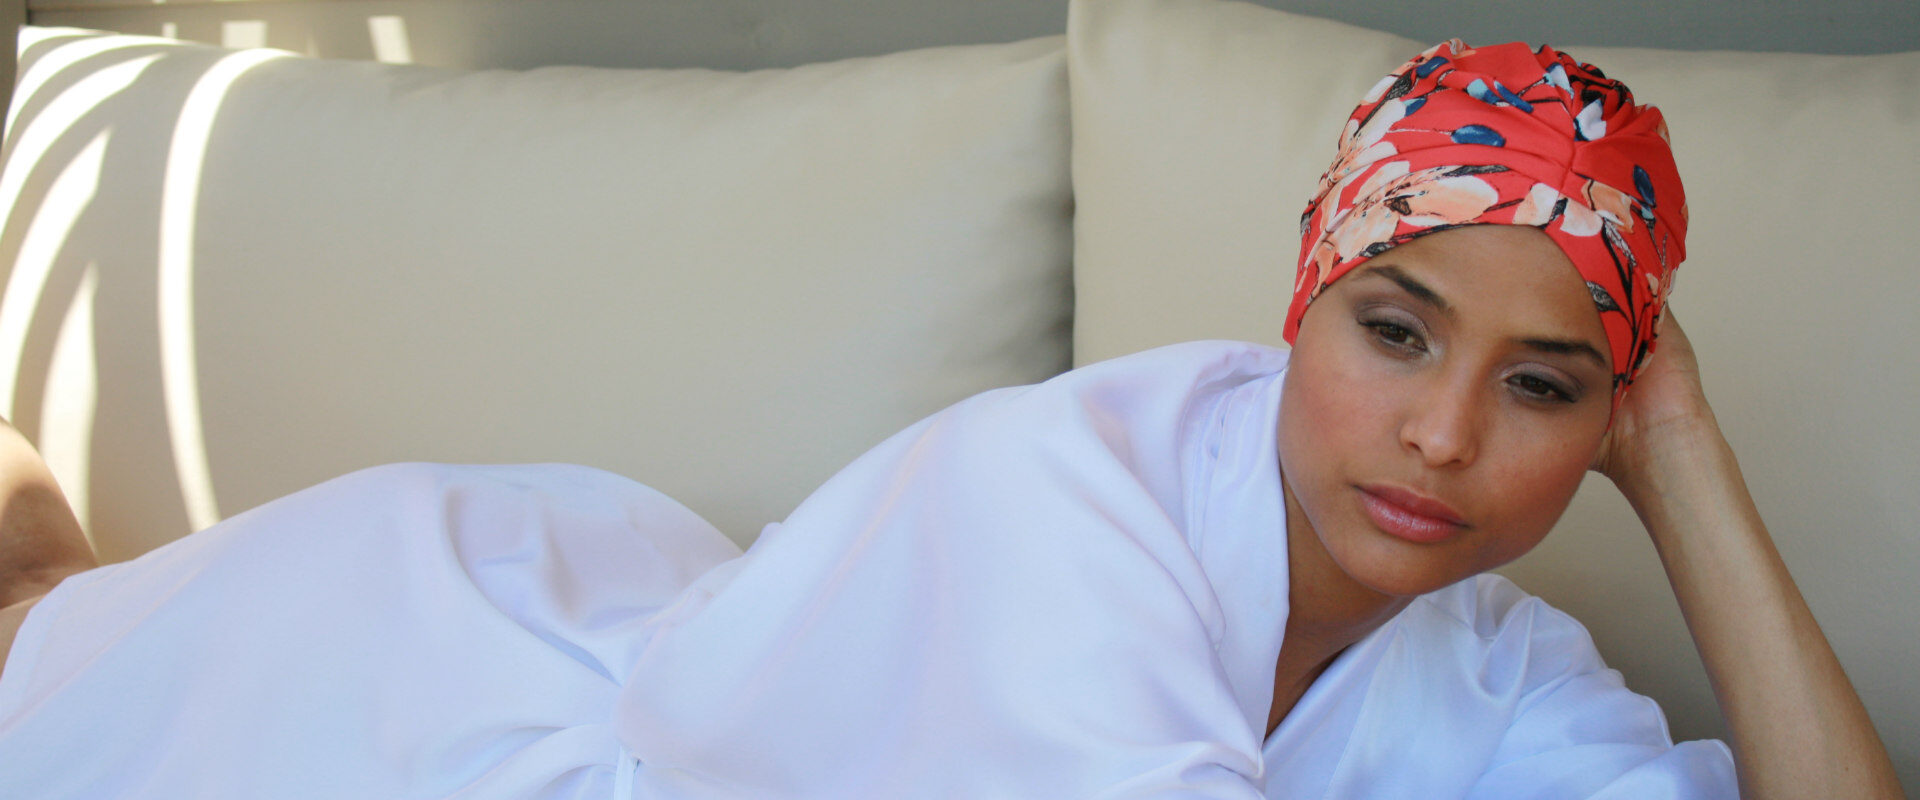 pañuelo quimioterapia verano